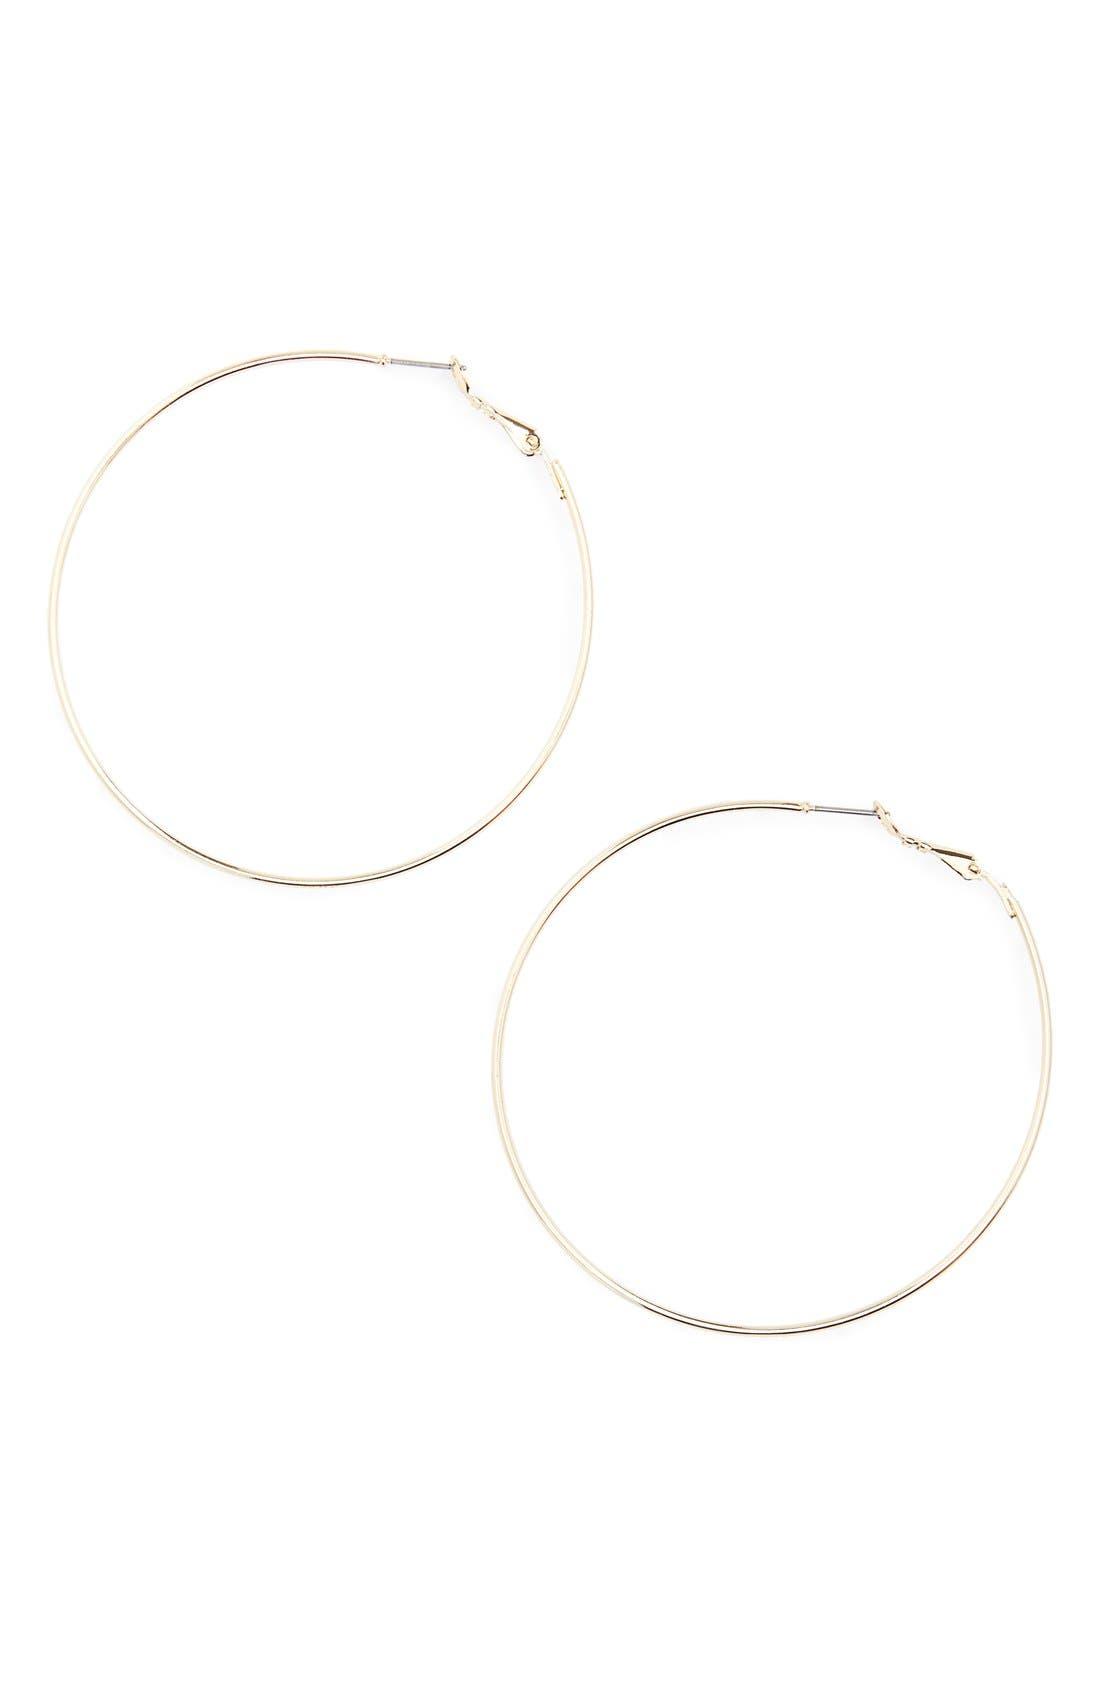 Large Hoop Earrings,                             Main thumbnail 1, color,                             GOLD